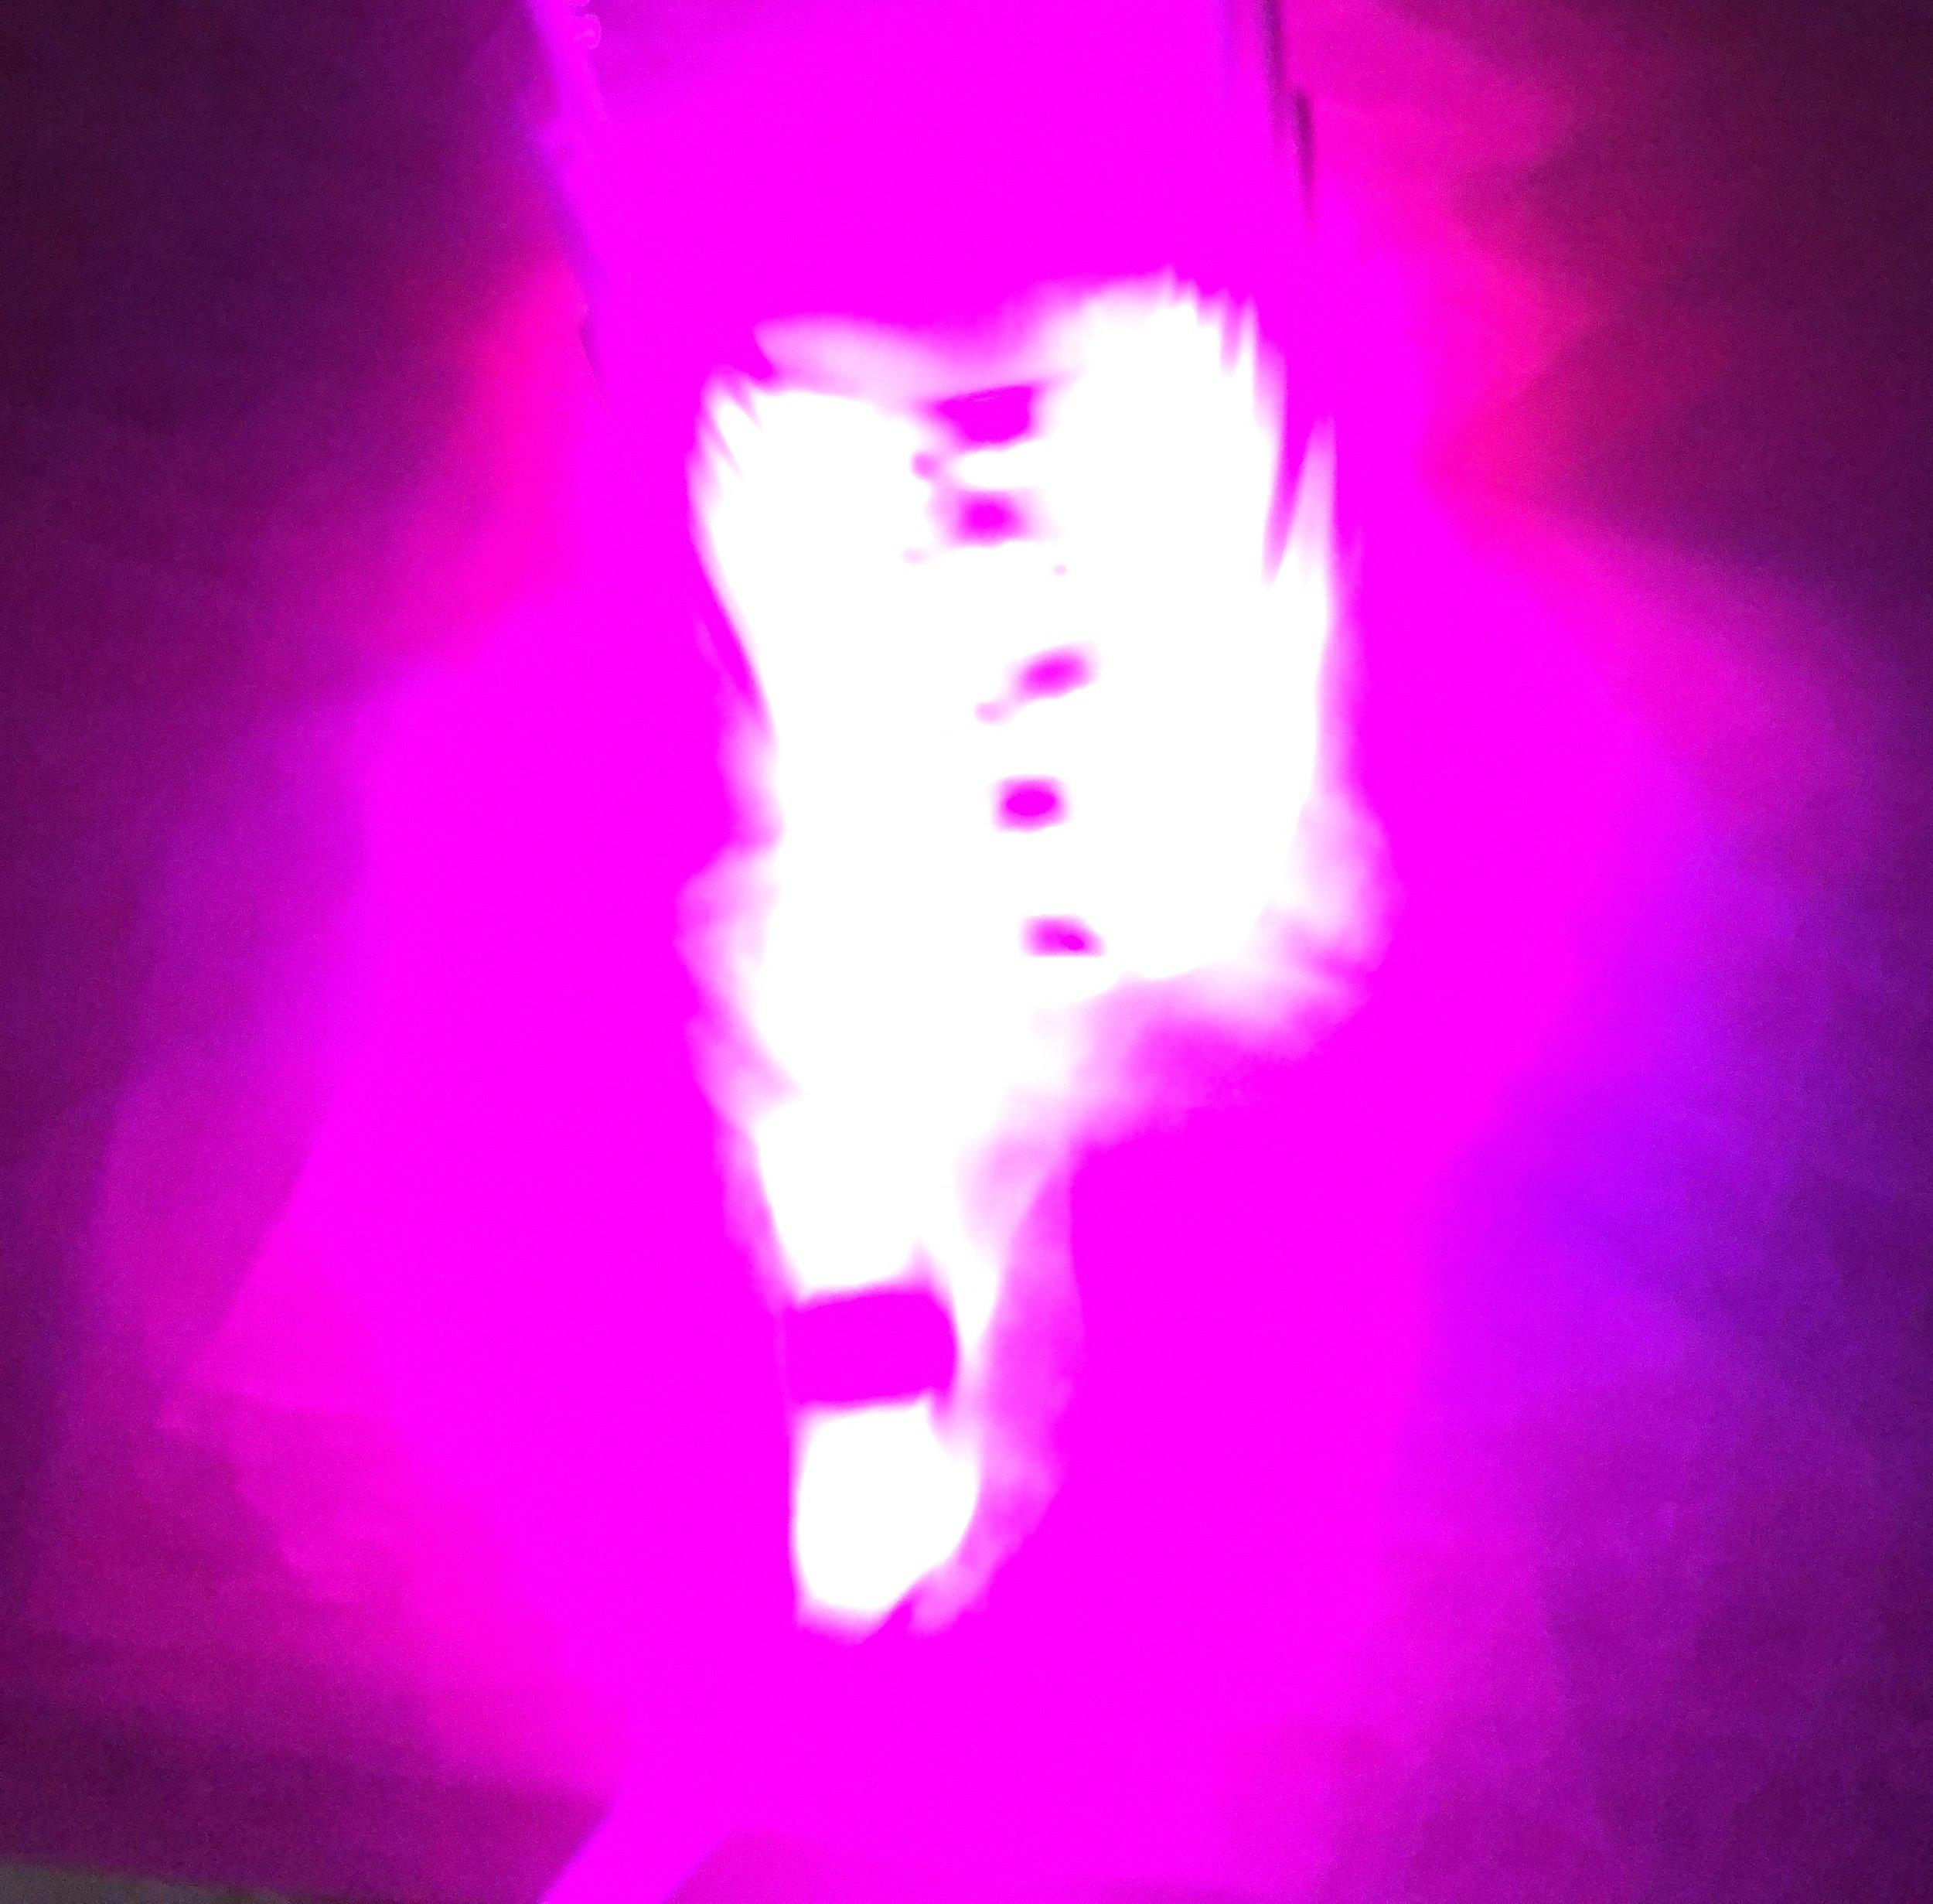 Pink Supernova (2019) digitally manipulated photo